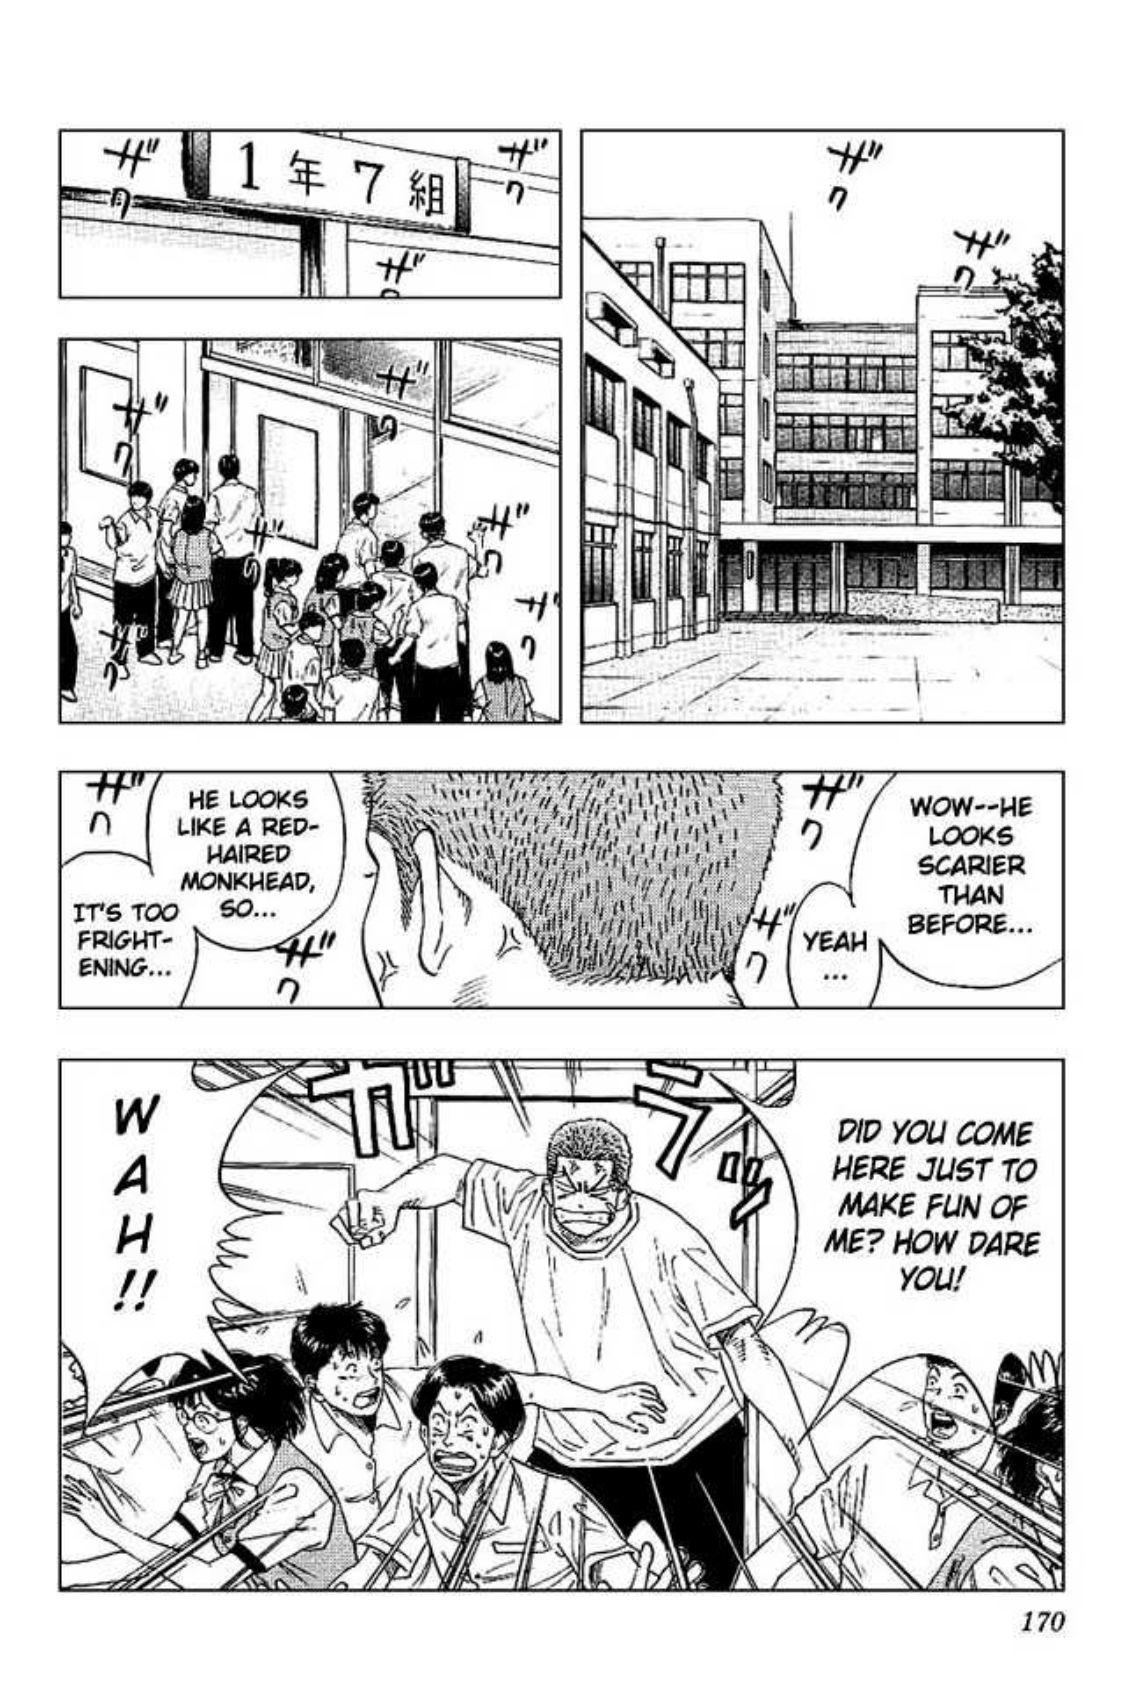 Pin by 𝔥𝔞𝔰𝔥𝔦𝔟𝔦𝔯𝔞 on anime & manga in 2020 Slam dunk